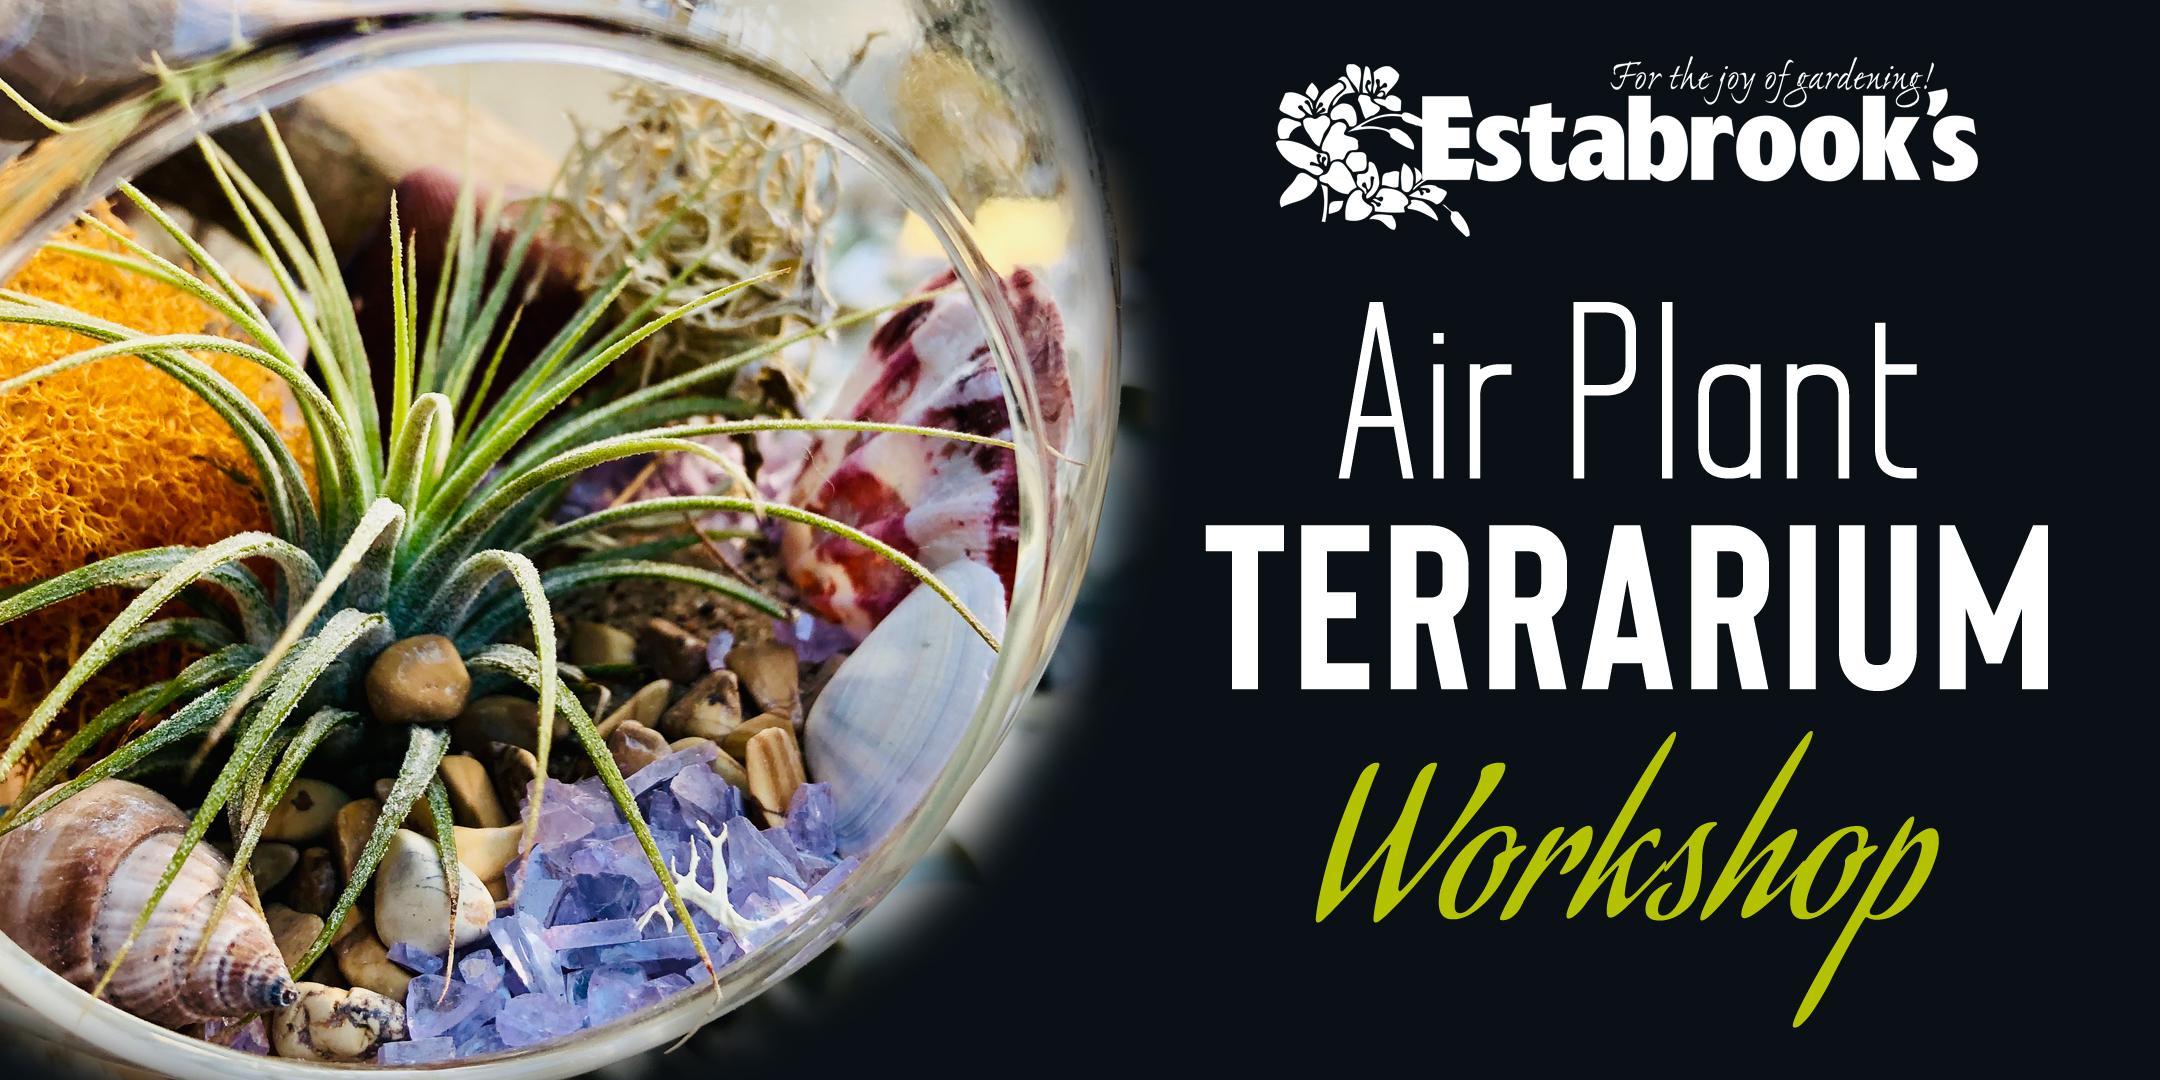 Air Plant Terrarium Workshop